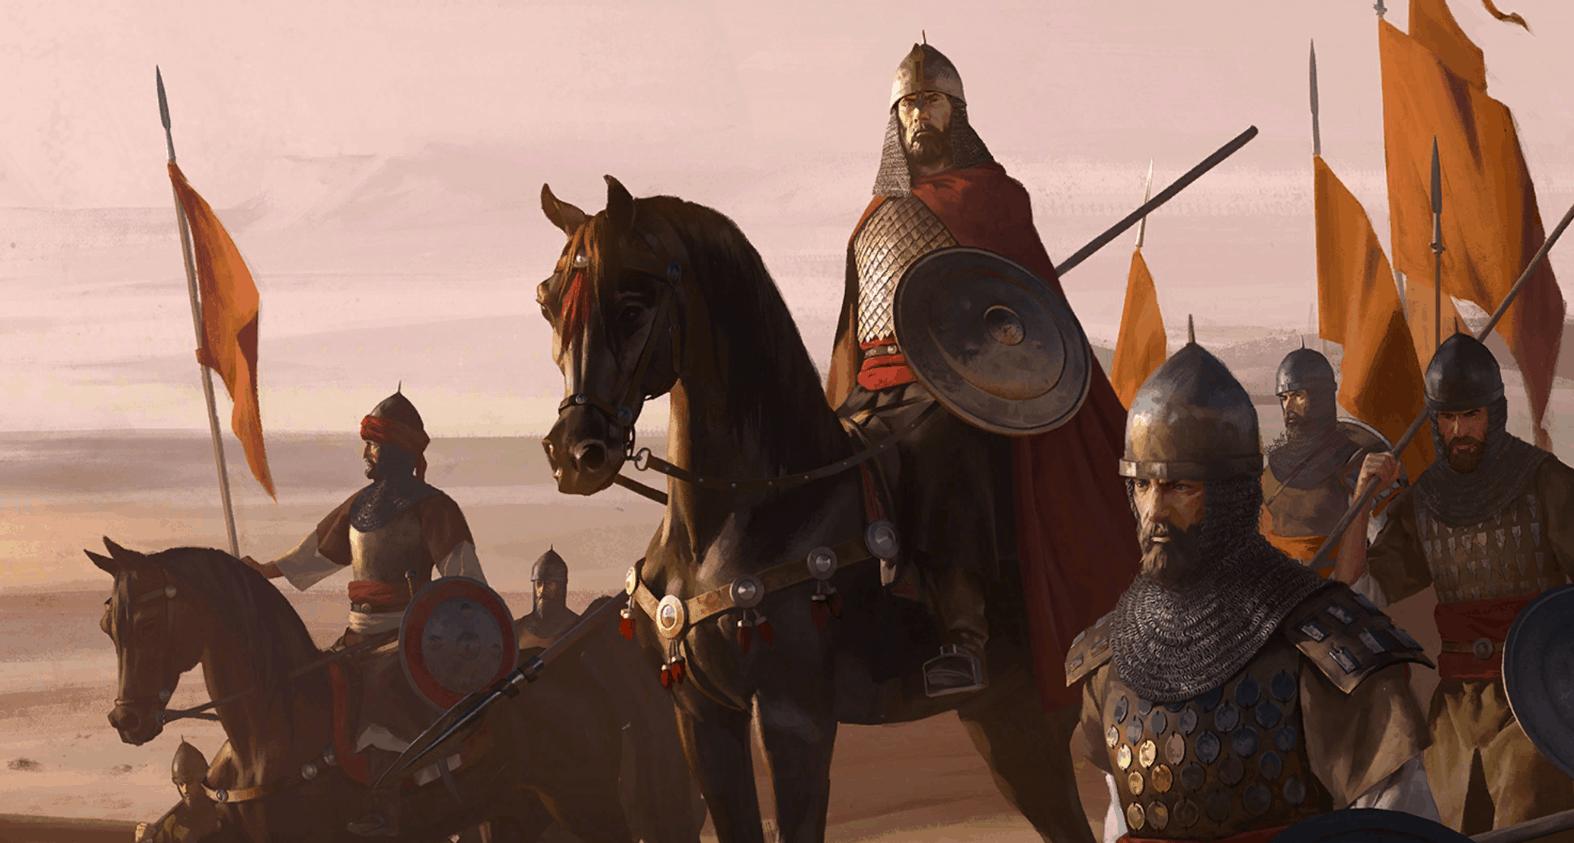 Turkish Studio Creates Global Gaming Sensation 'Bannerlord'